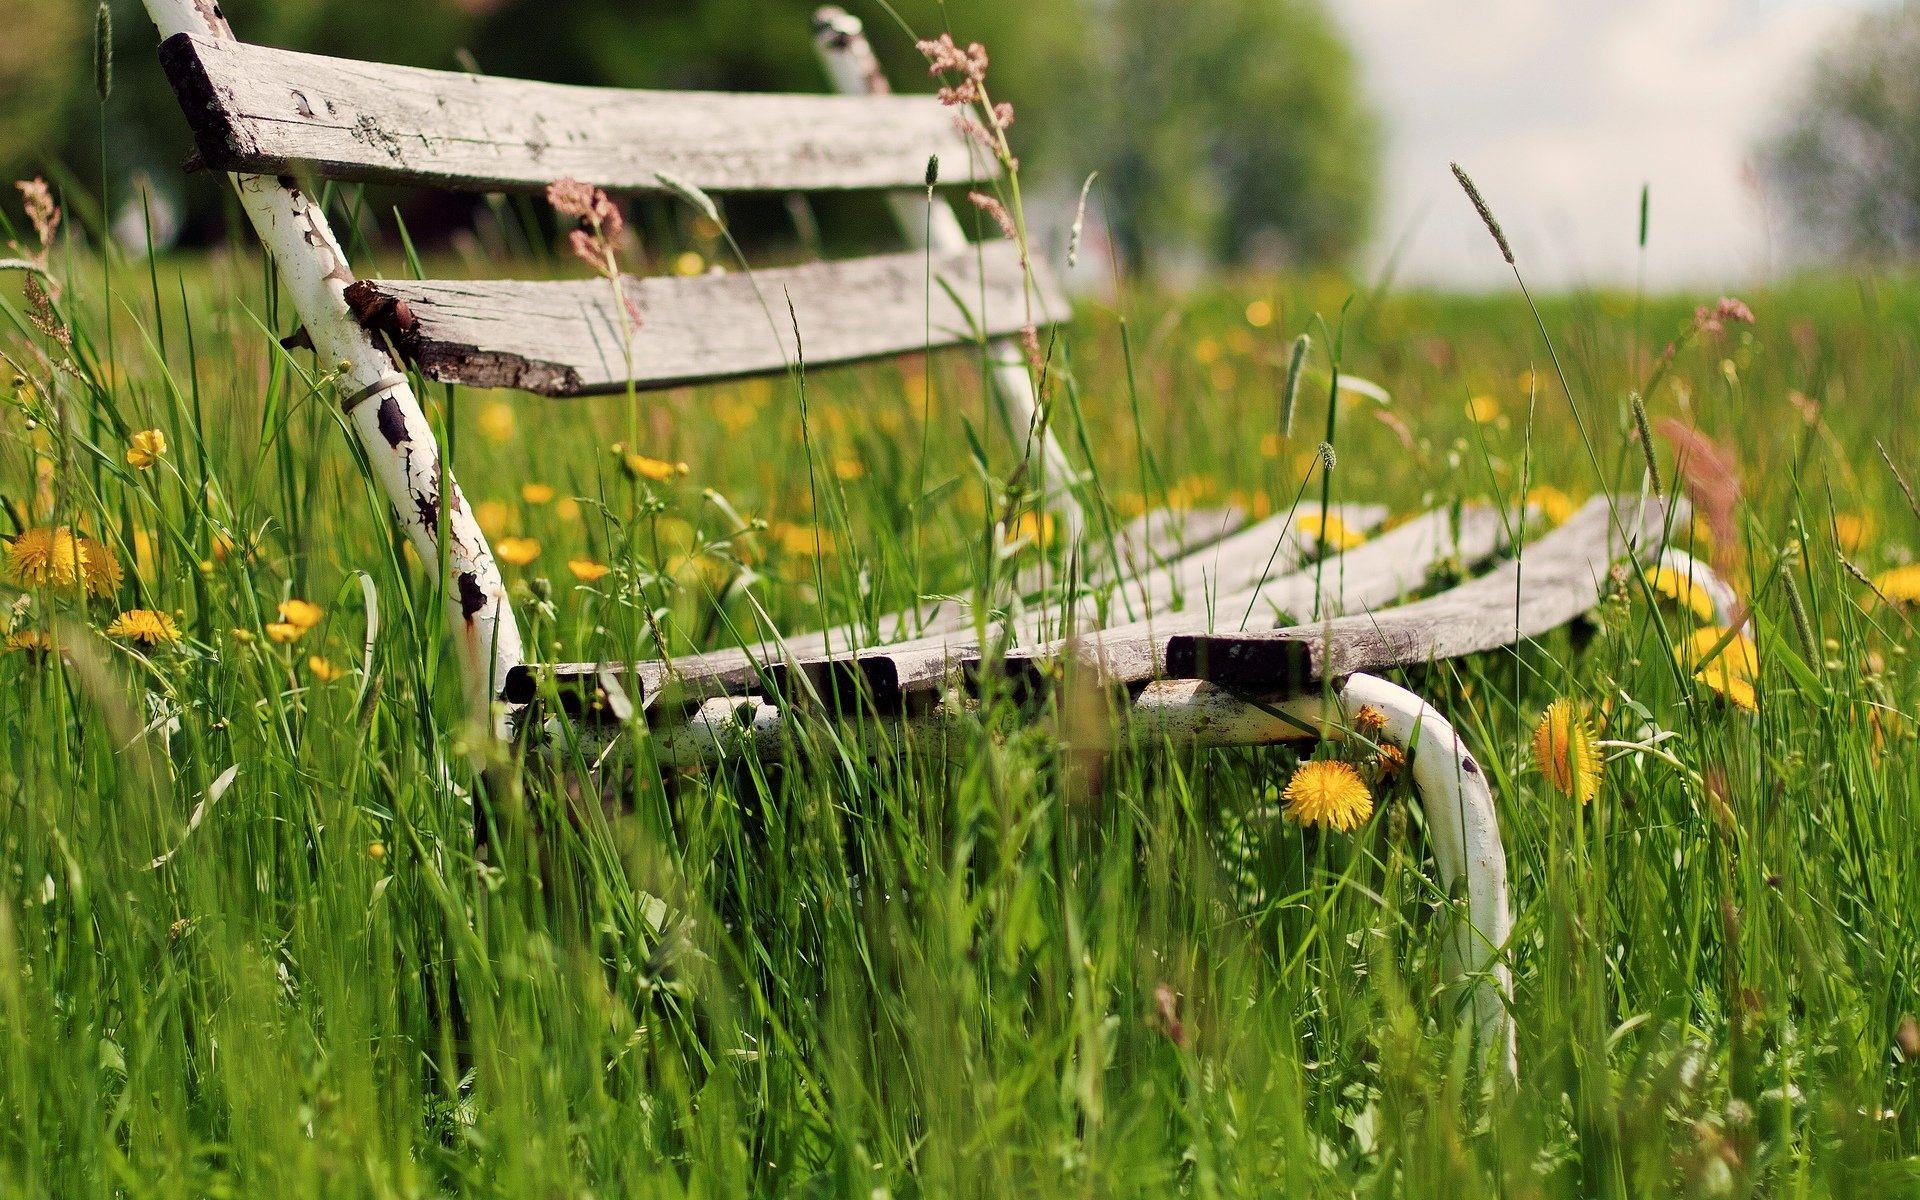 природа трава скамейка бесплатно